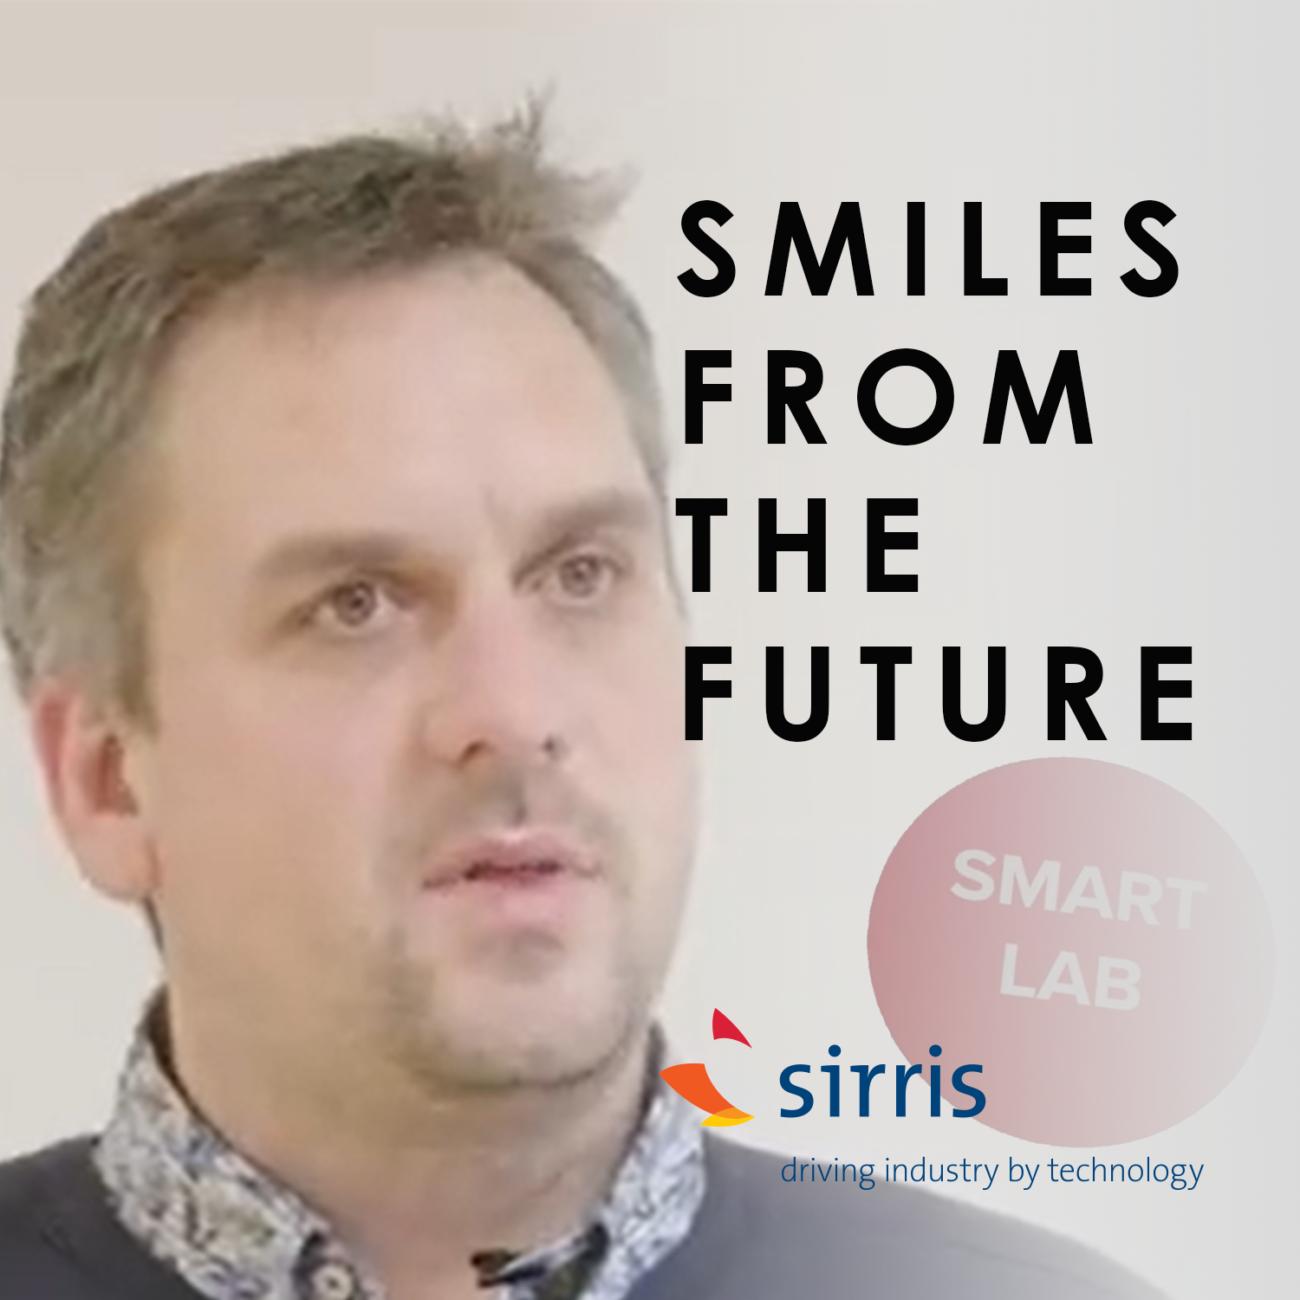 Sirris smartlab